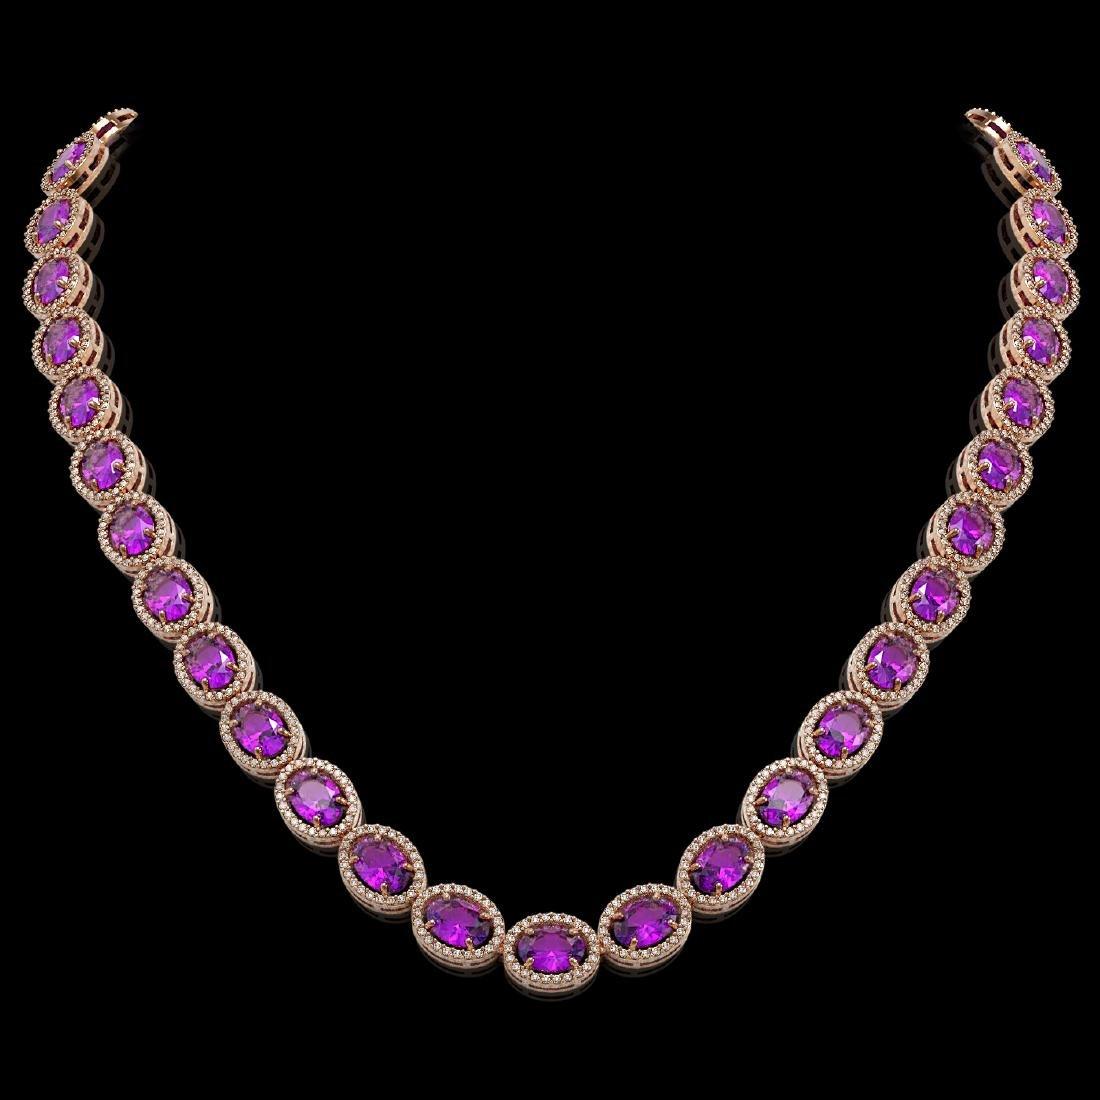 45.16 CTW Amethyst & Diamond Halo Necklace 10K Rose